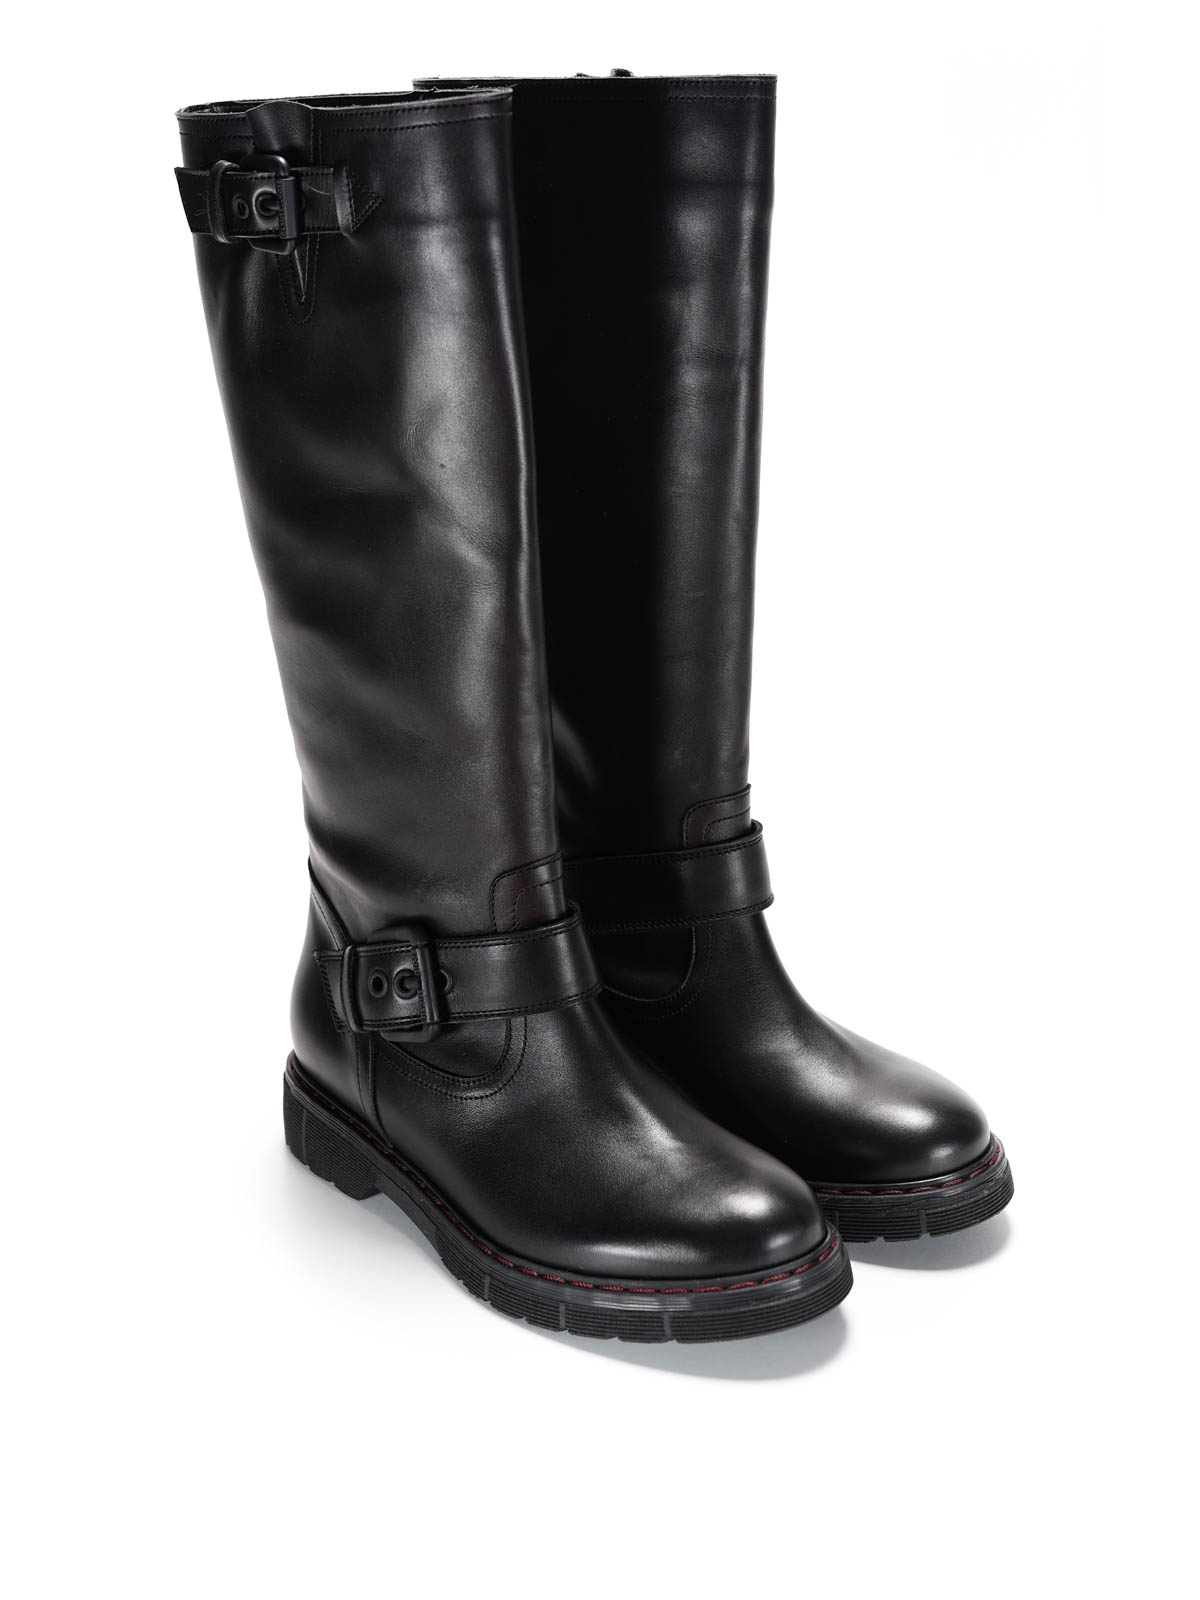 l 39 autre chose buckles leather boots boots ldb314. Black Bedroom Furniture Sets. Home Design Ideas